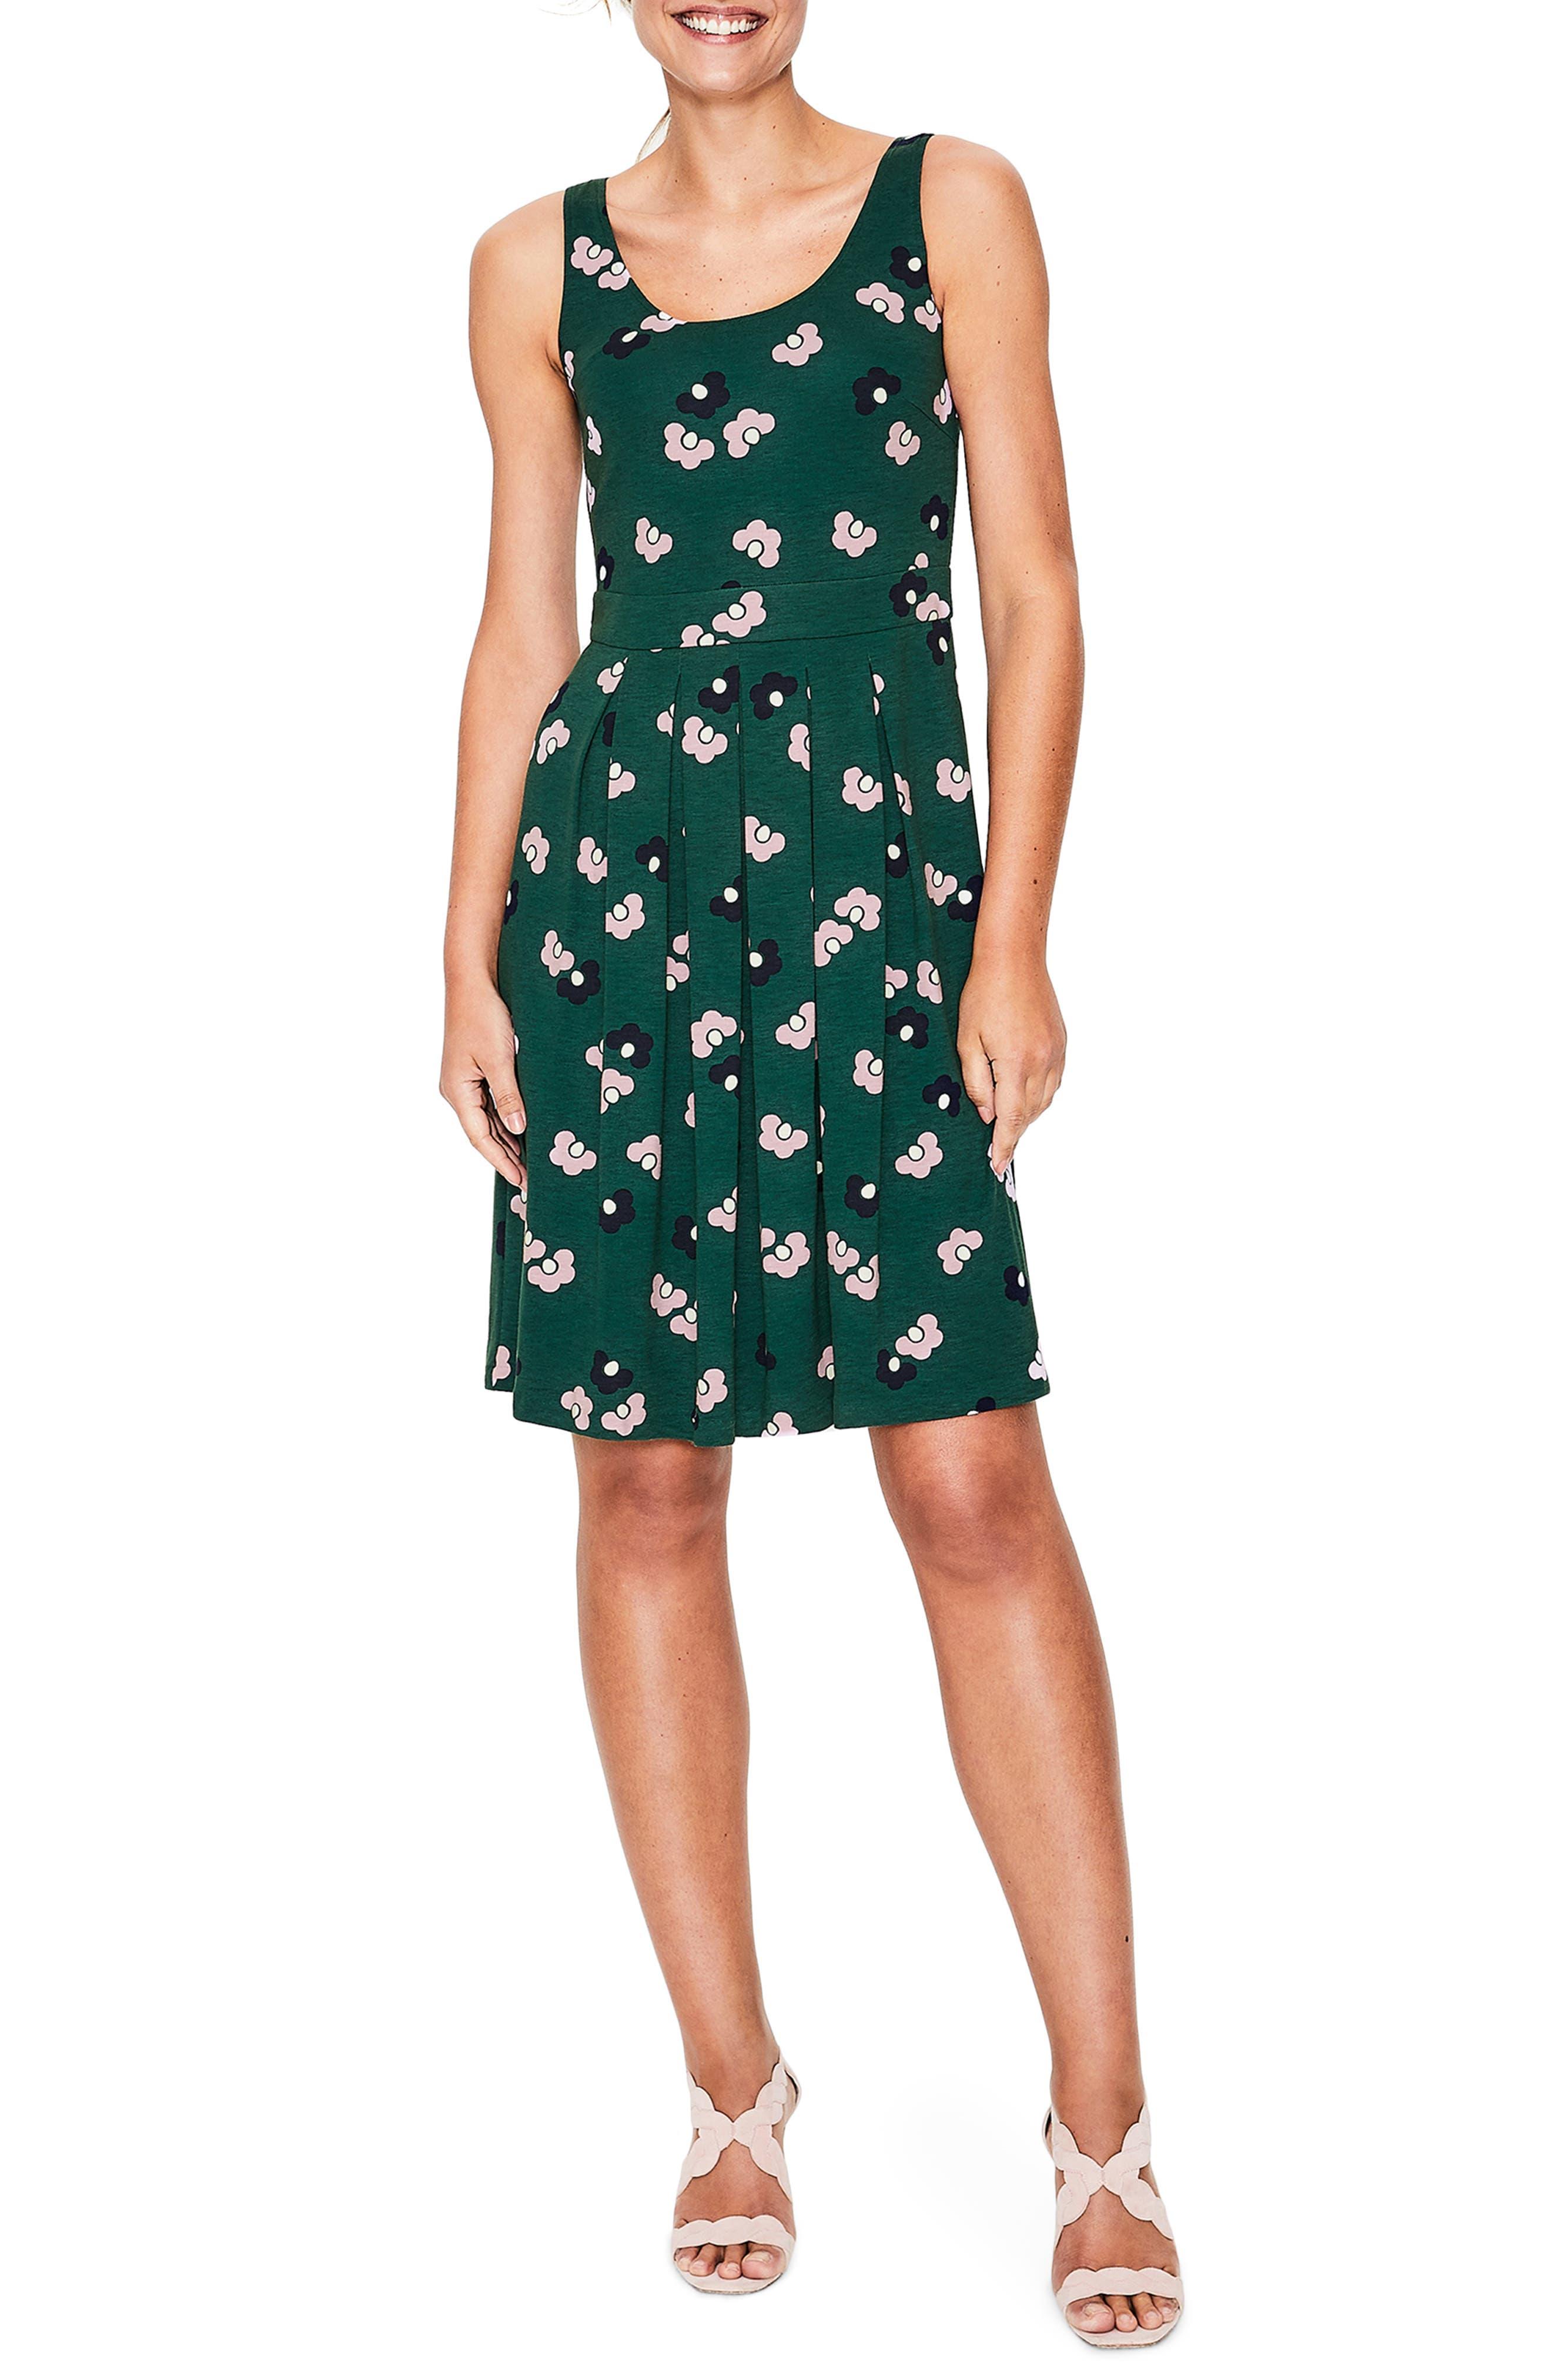 Boden Joanna Fit & Flare Ponte Dress, Green